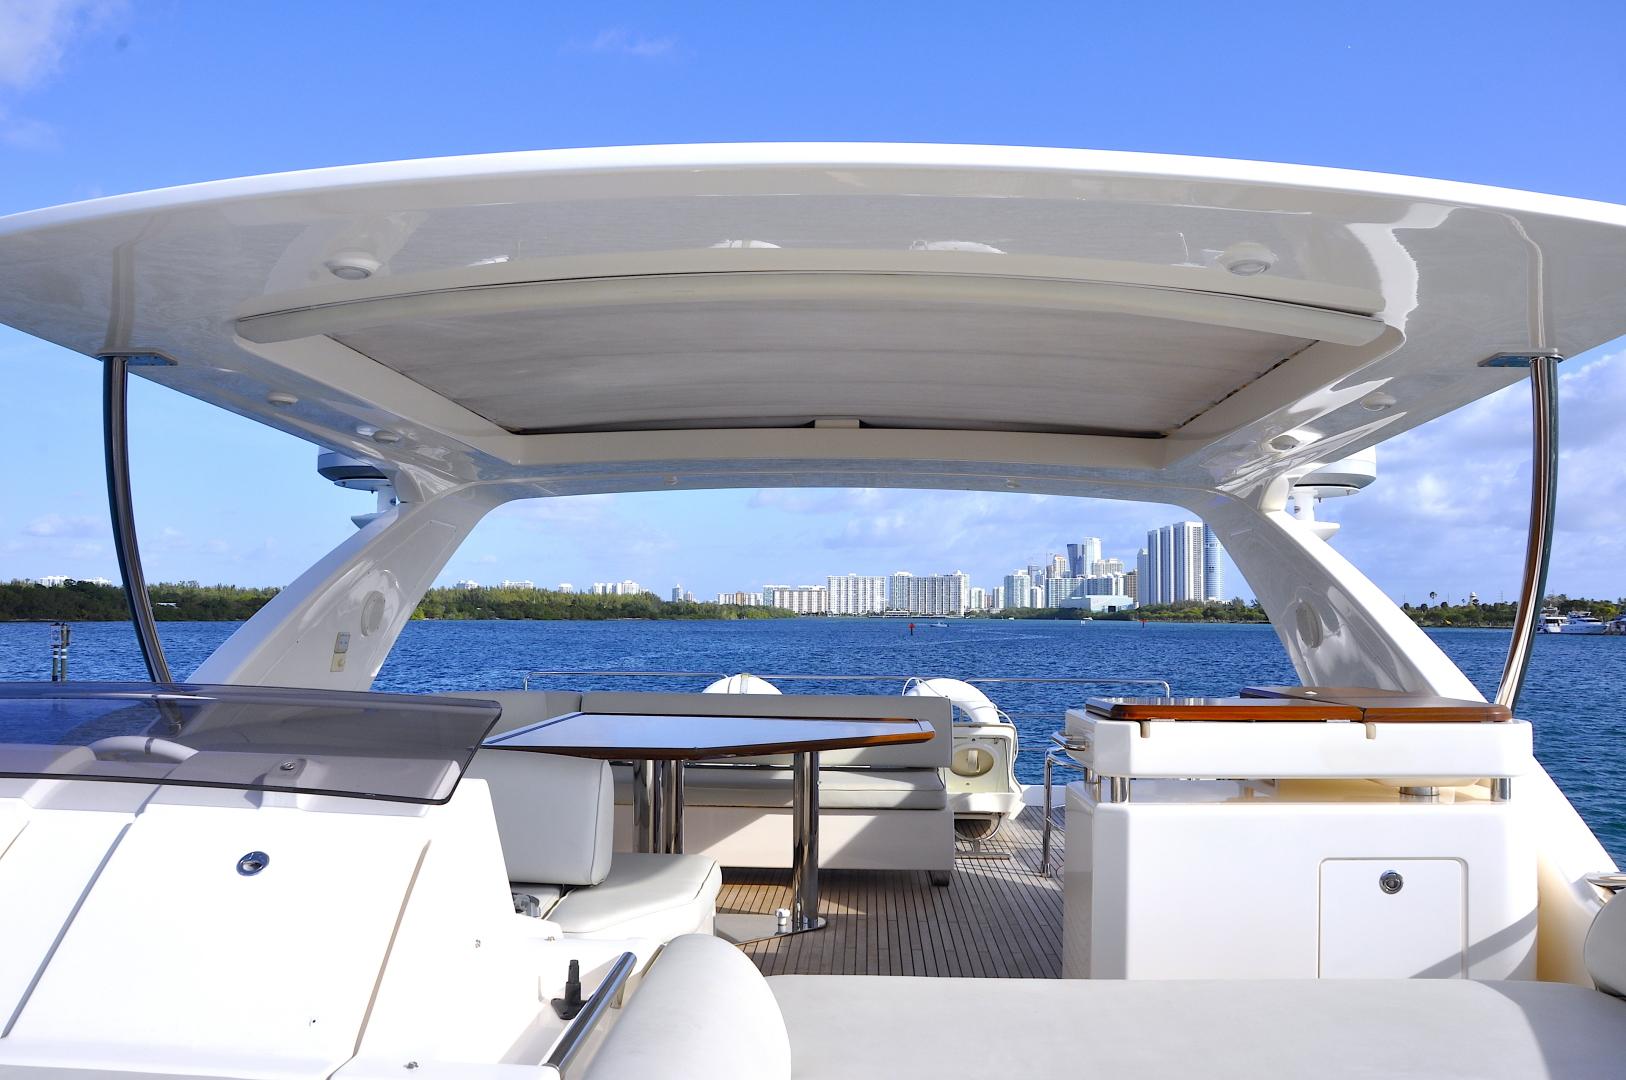 Azimut-70 Flybridge 2012-PRIVATE RESERVE Detroit-Michigan-United States-1345299   Thumbnail